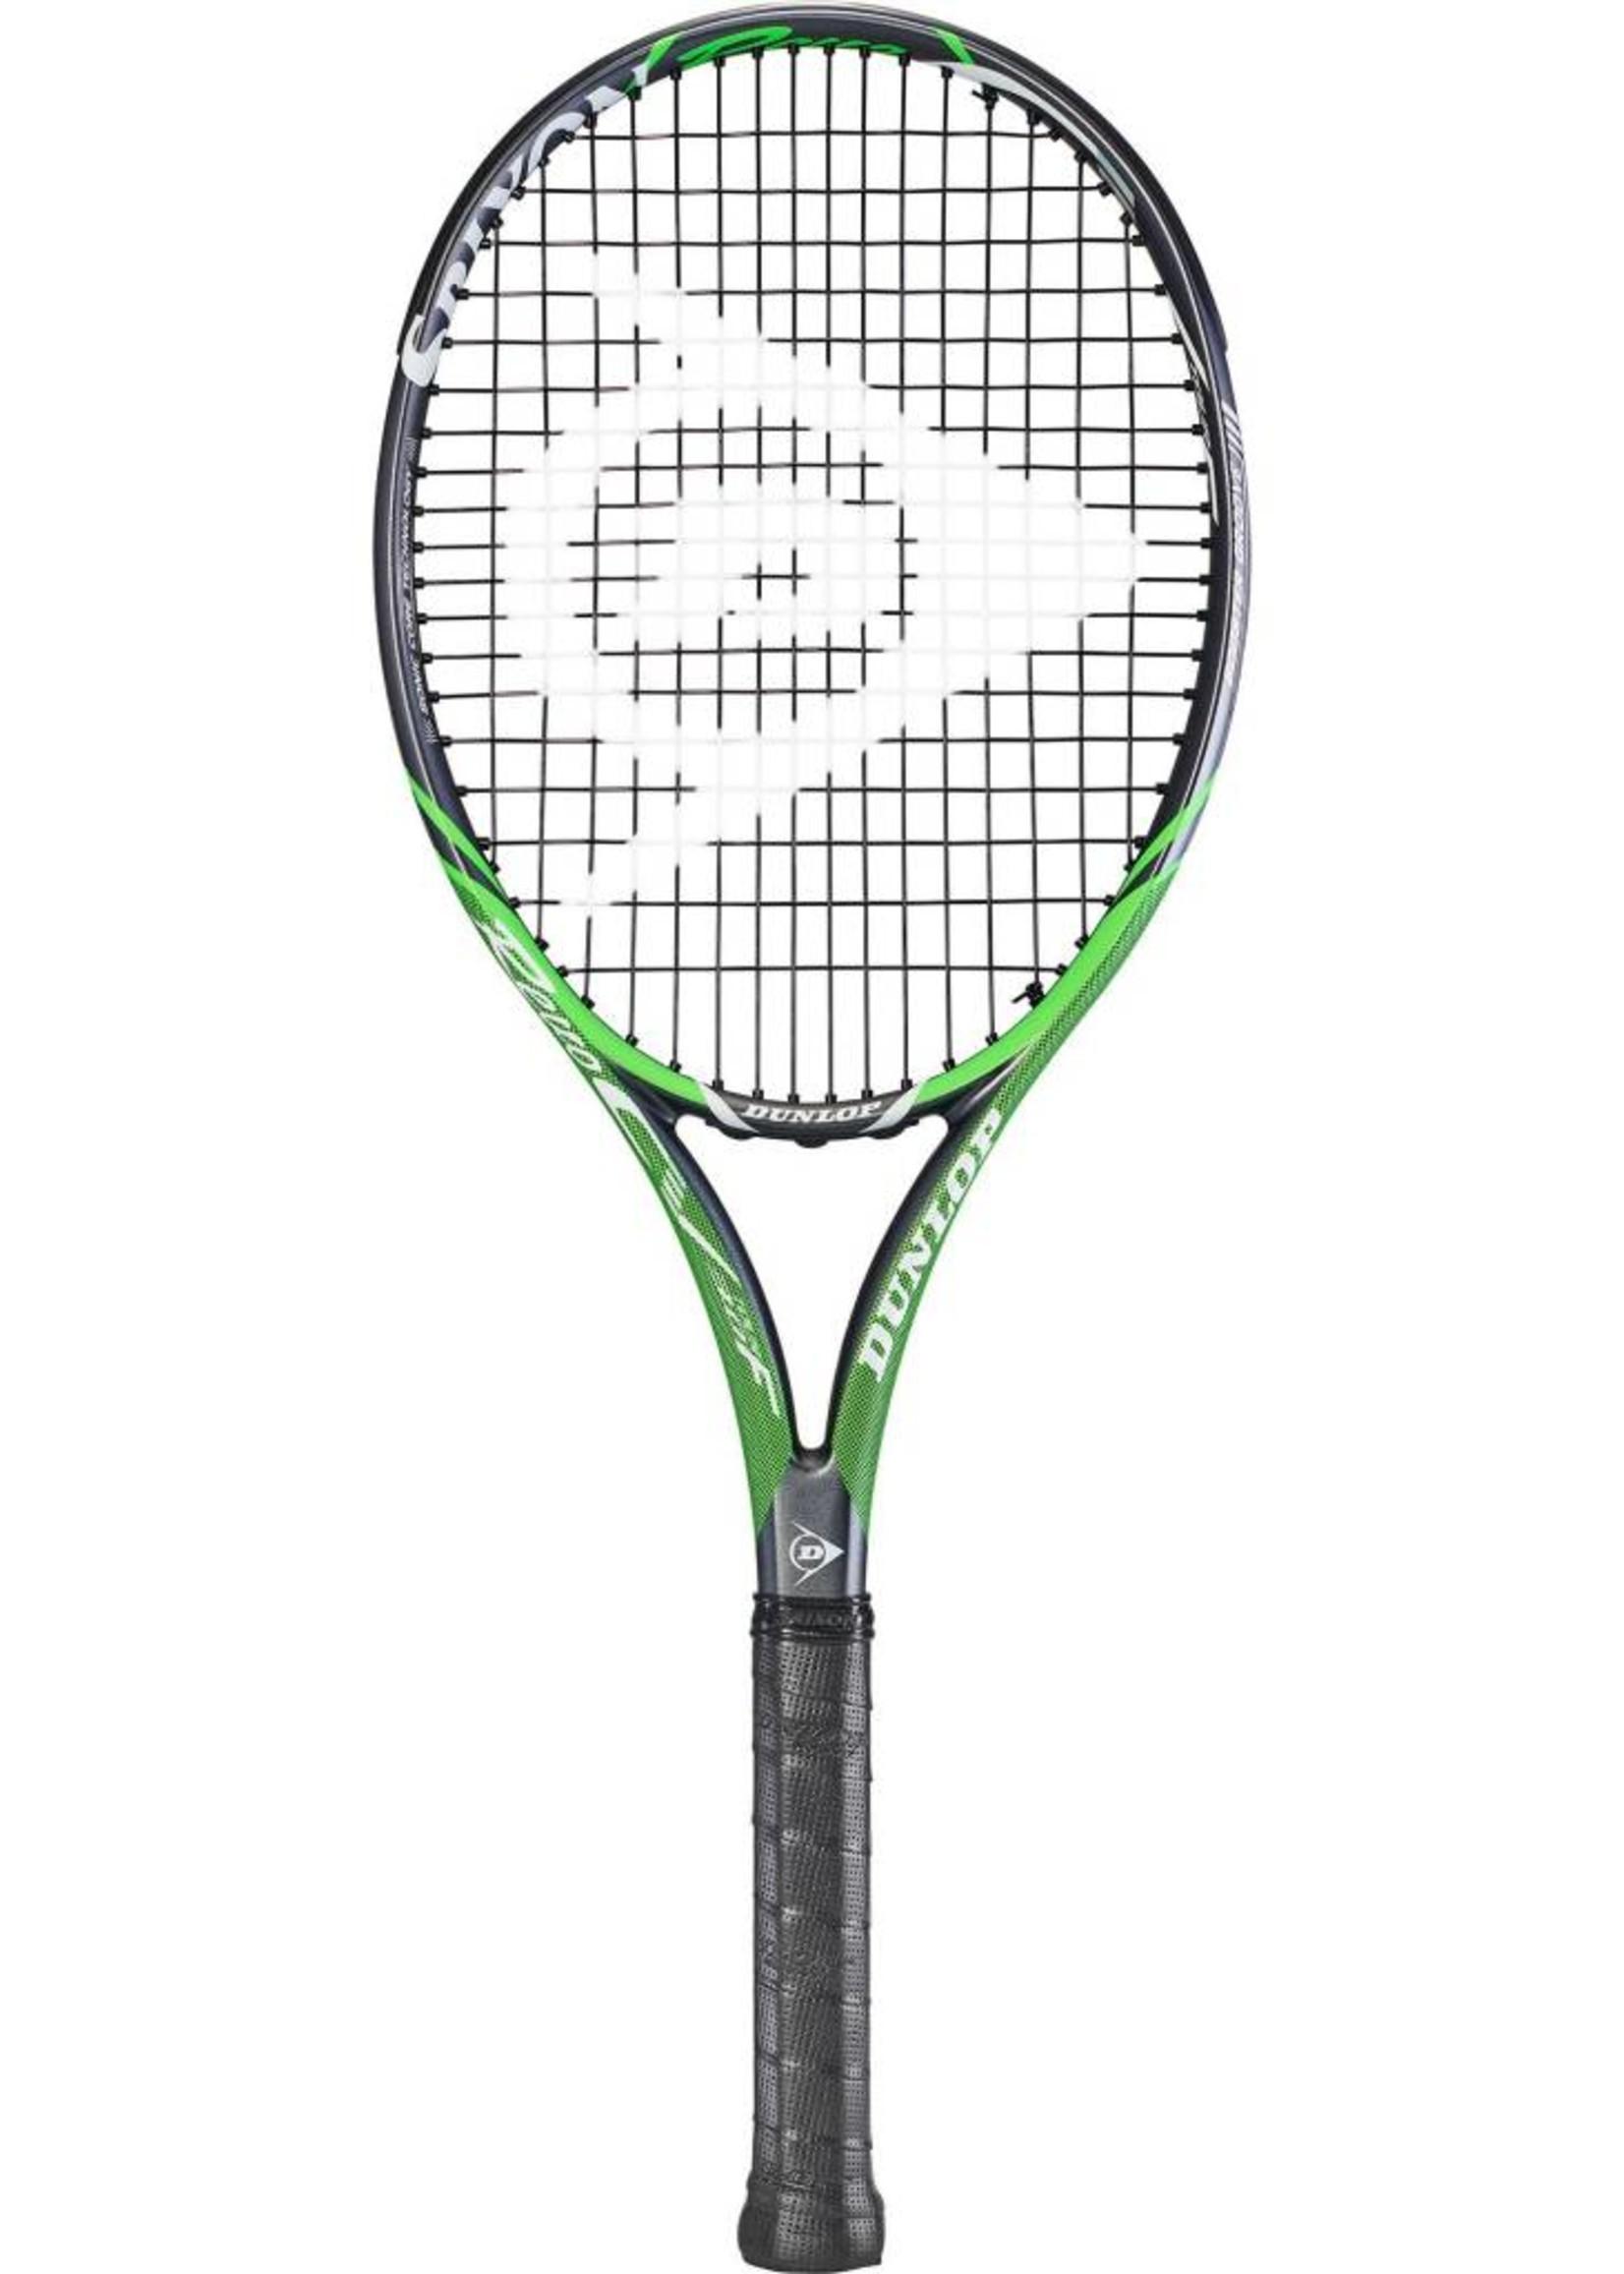 Dunlop Srixon Dunlop Srixon CV 3.0 F Tour Tennis Racket (2018)